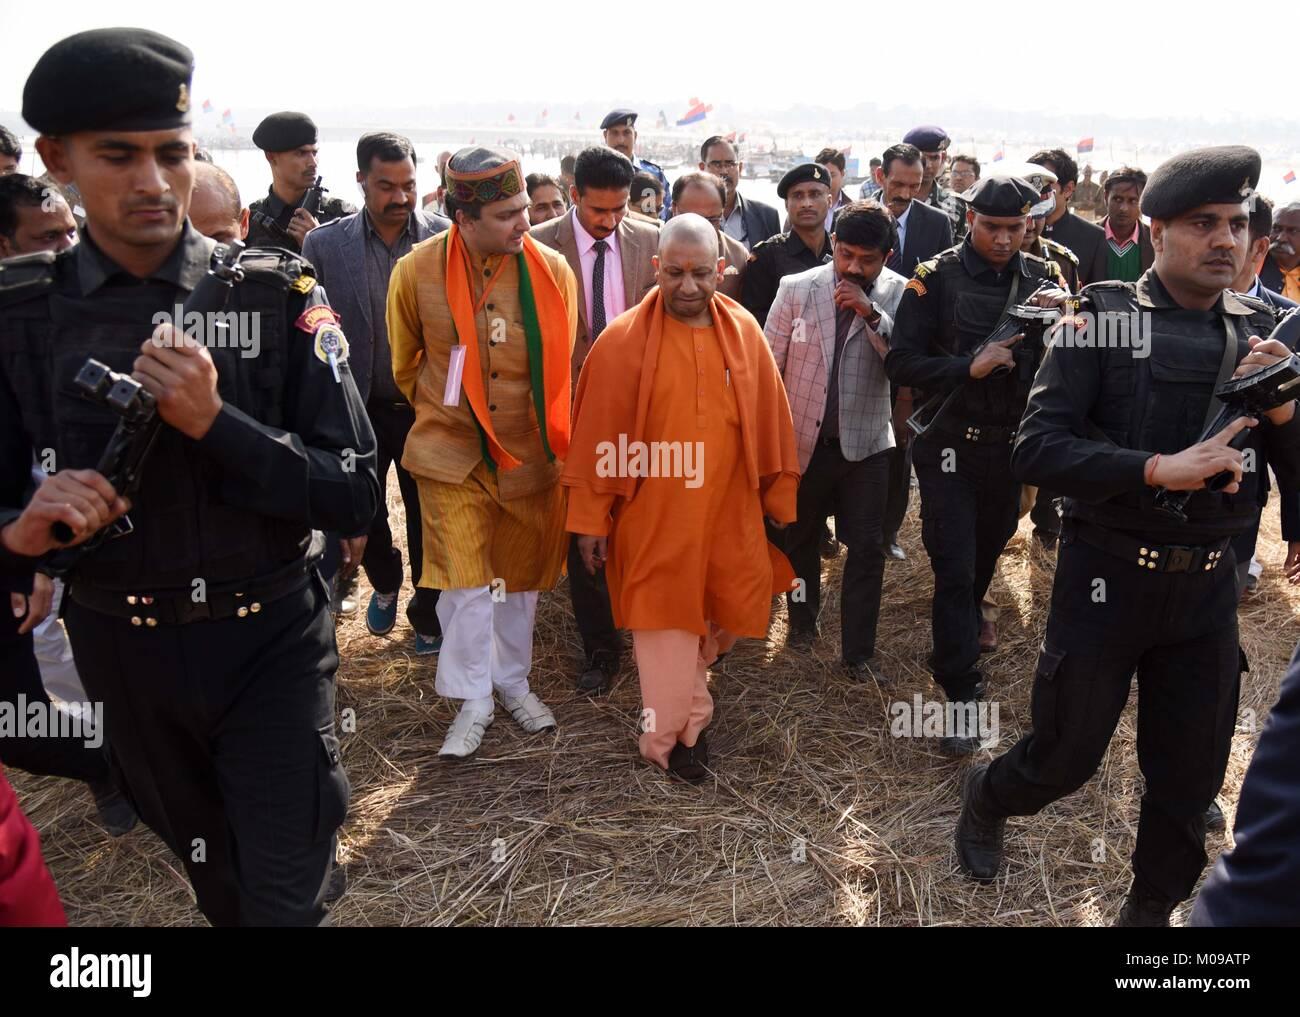 Aditya Nath Yogi Photos Stock Des Images